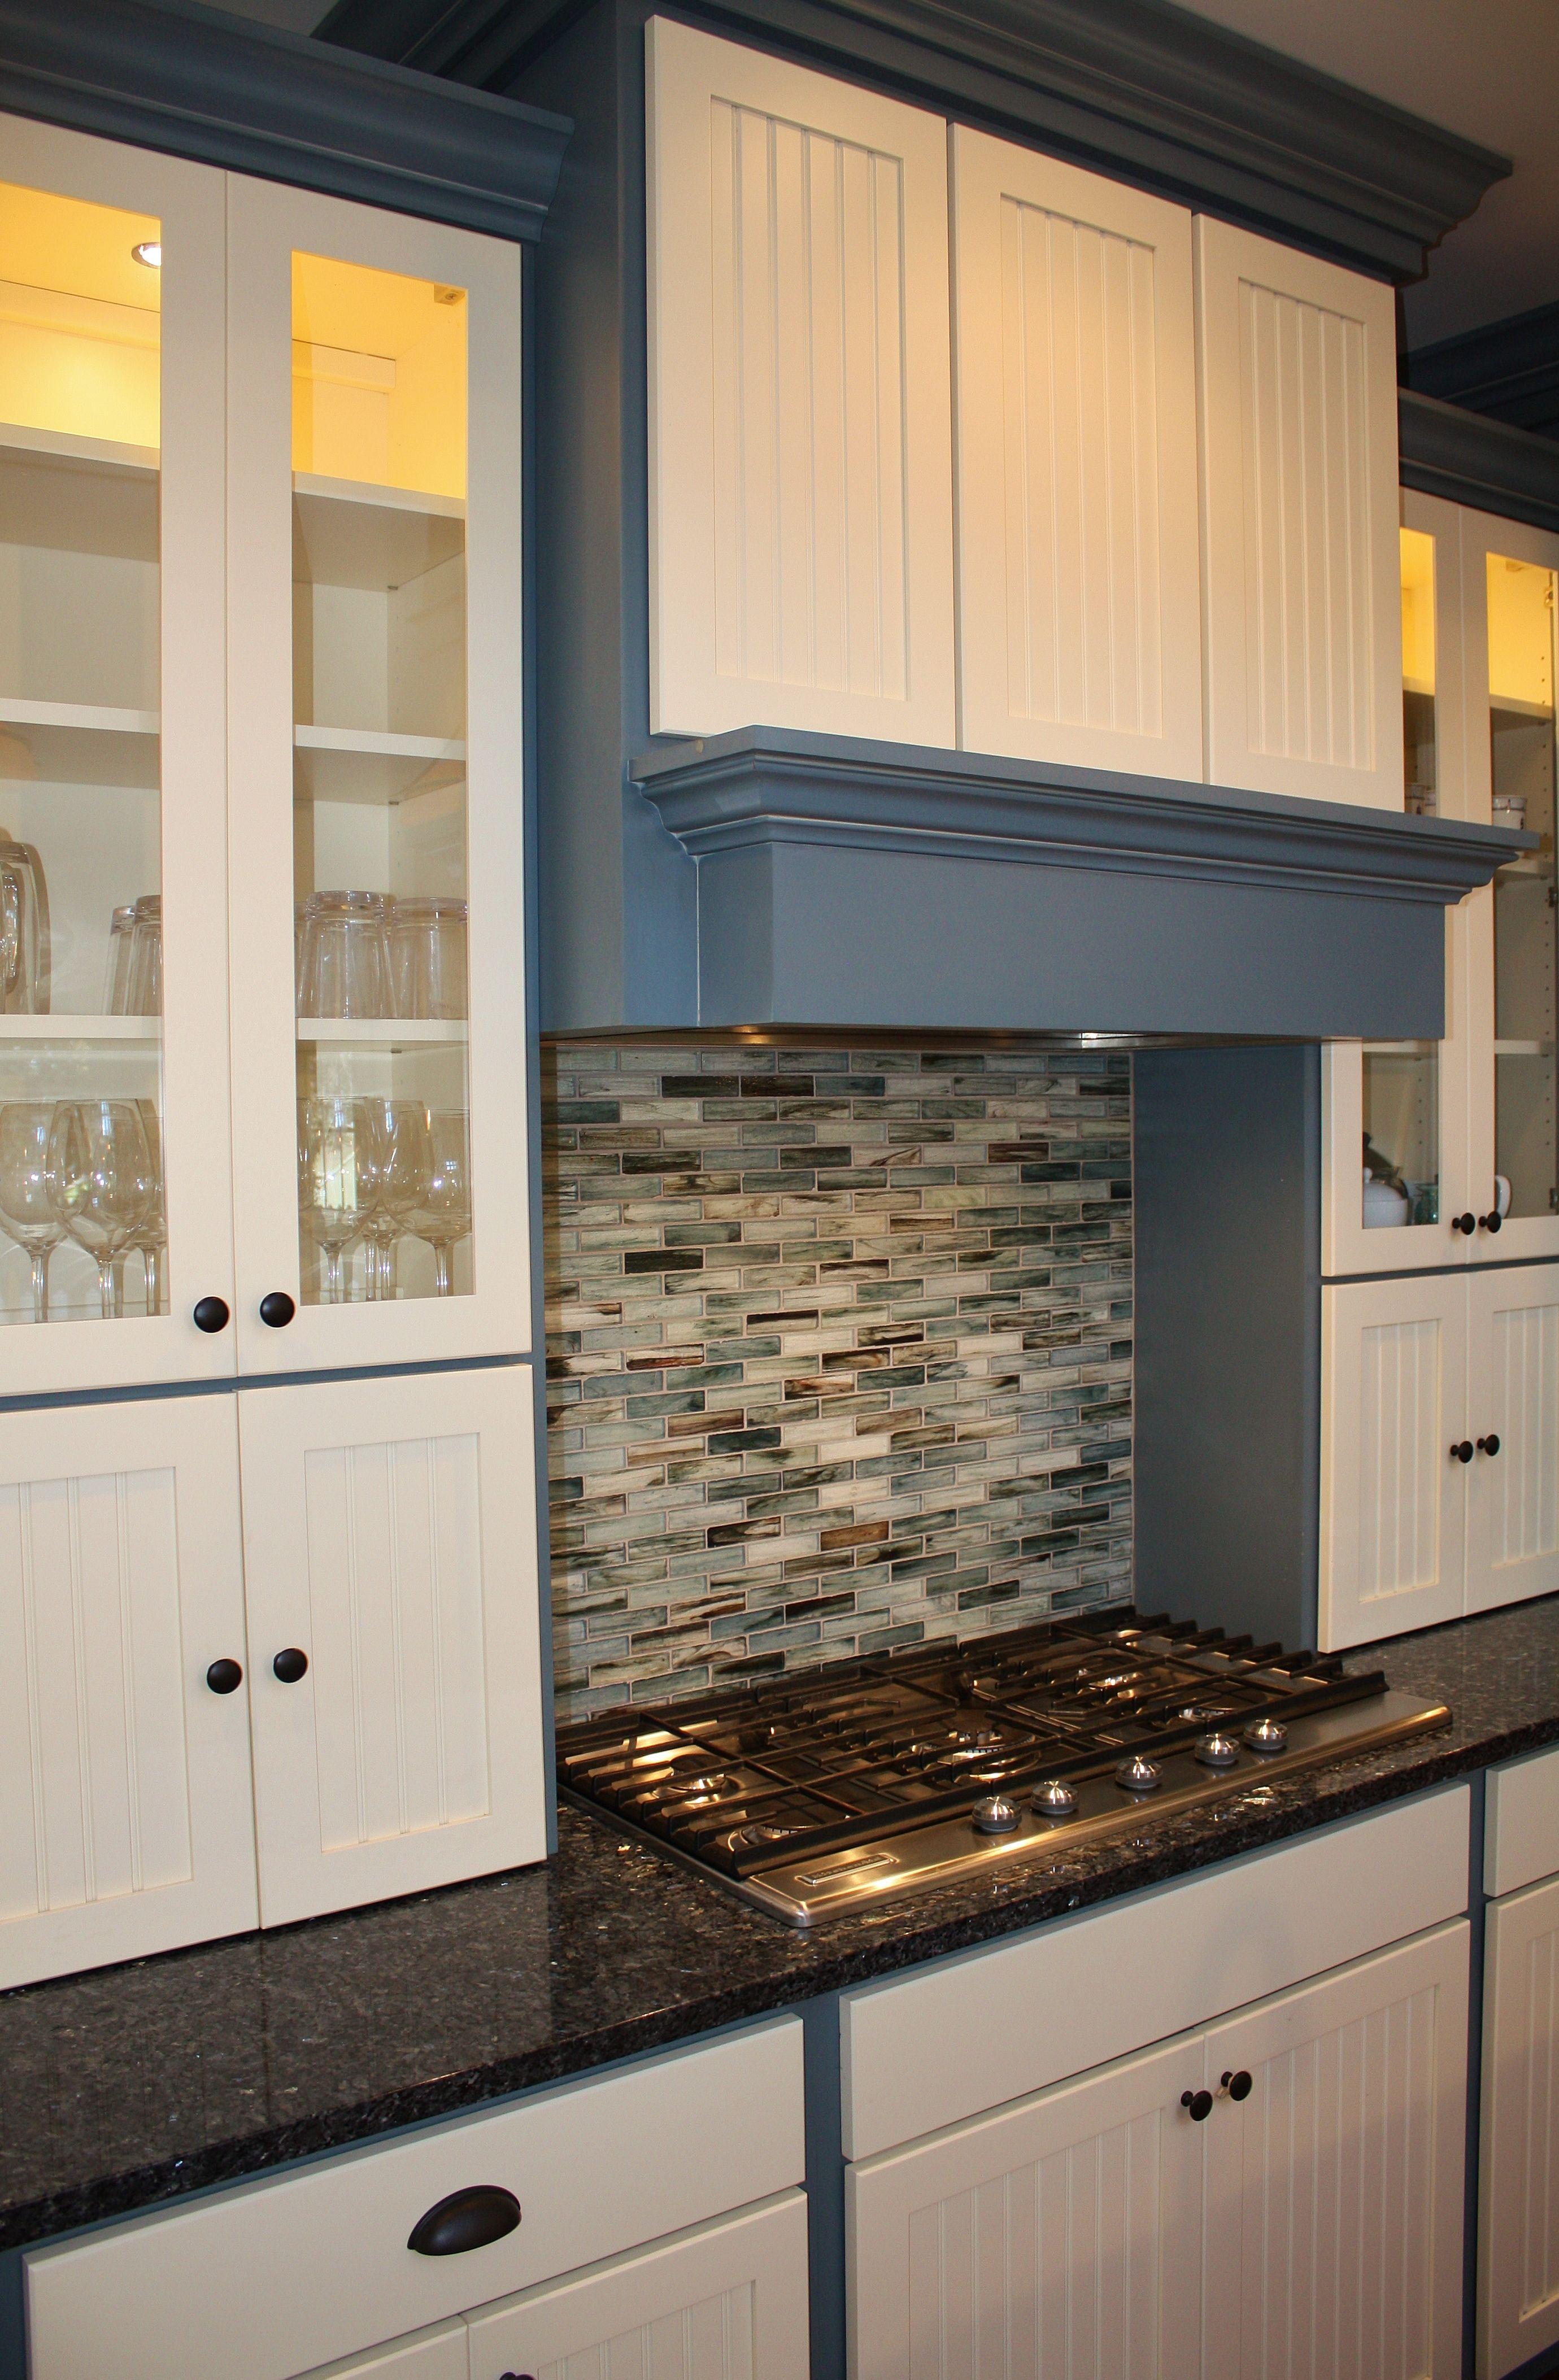 Holiday Kitchen cabinets, Cambria Quartz countertops, new build ...